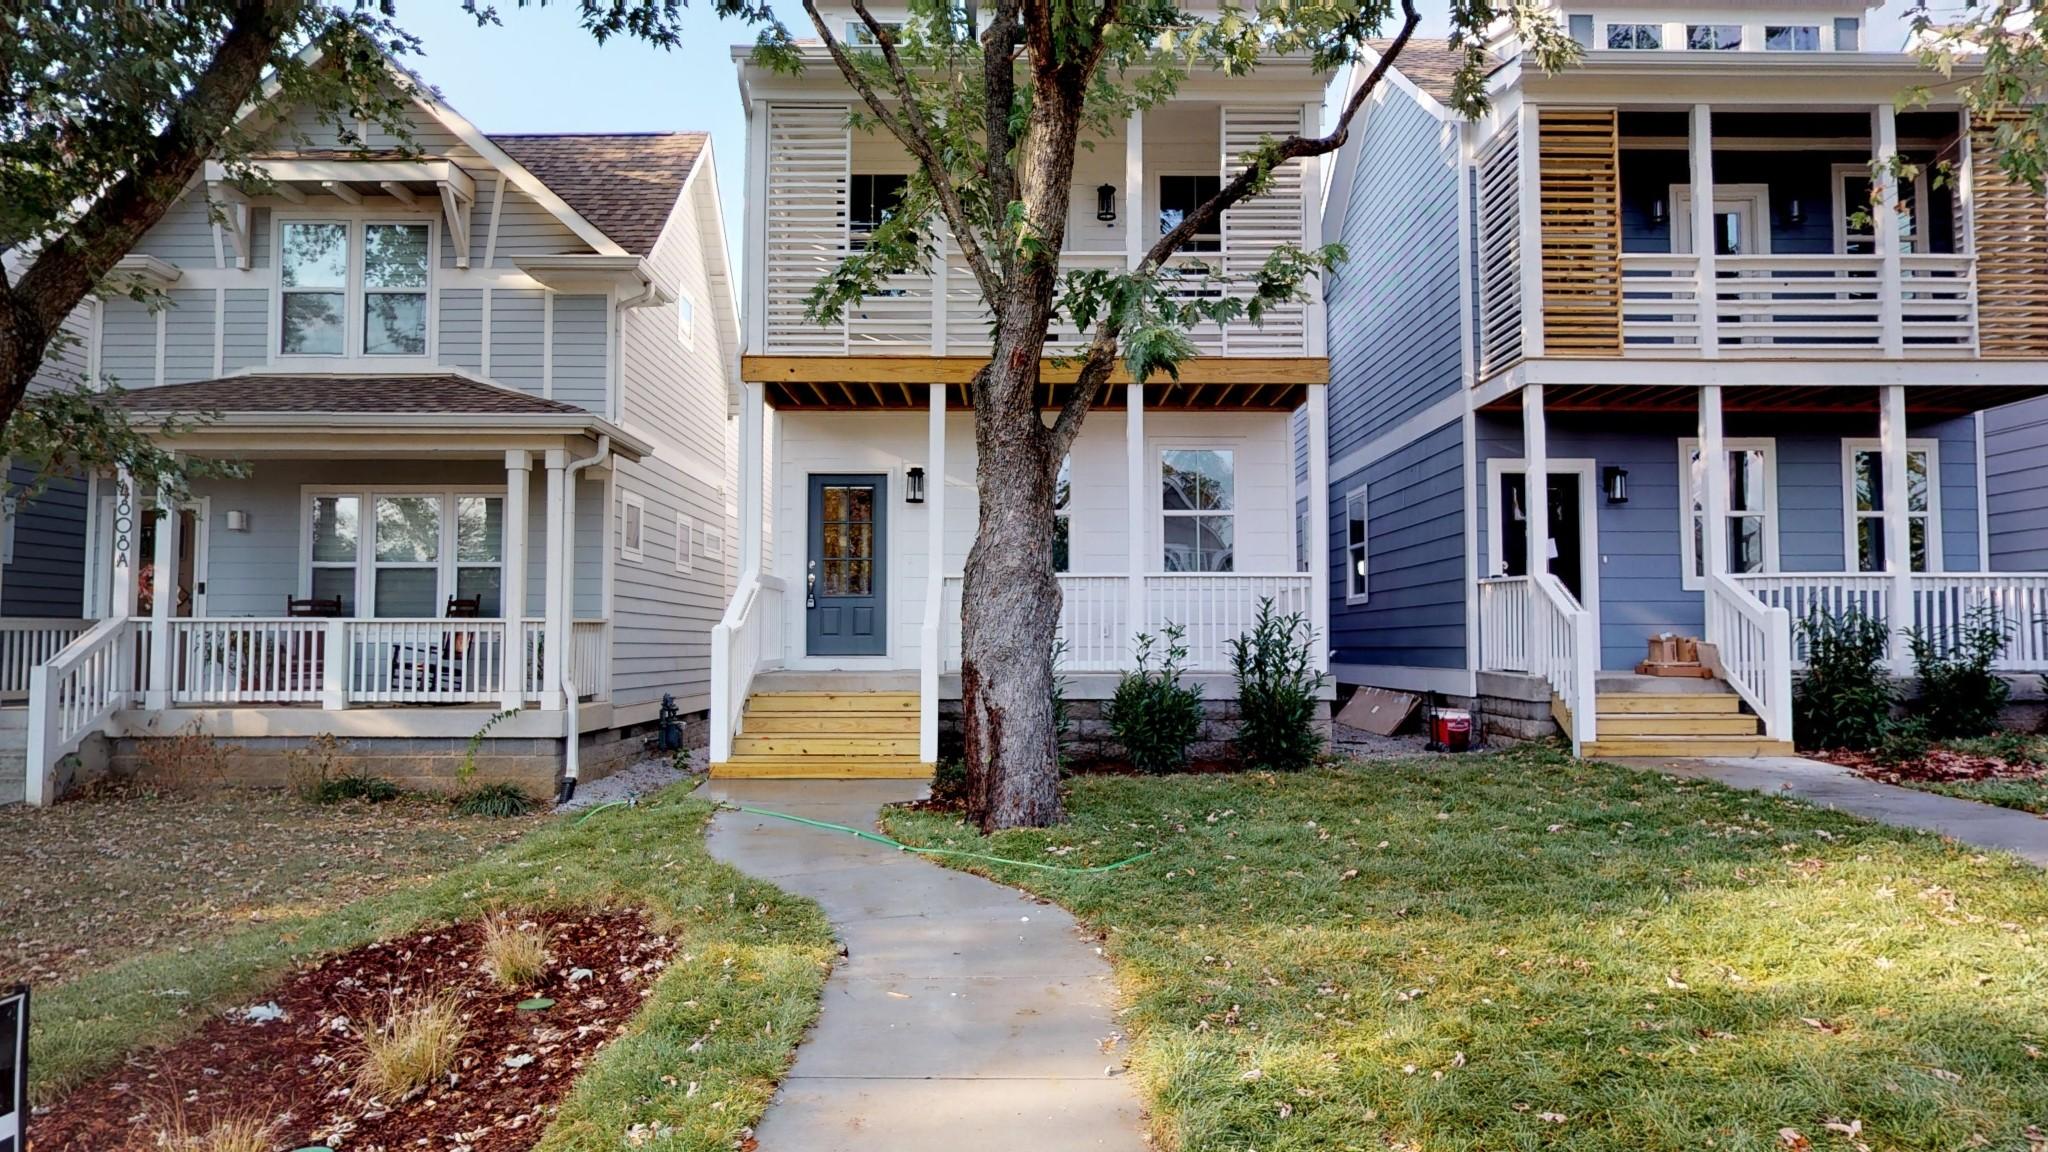 4908A Michigan Ave Property Photo - Nashville, TN real estate listing